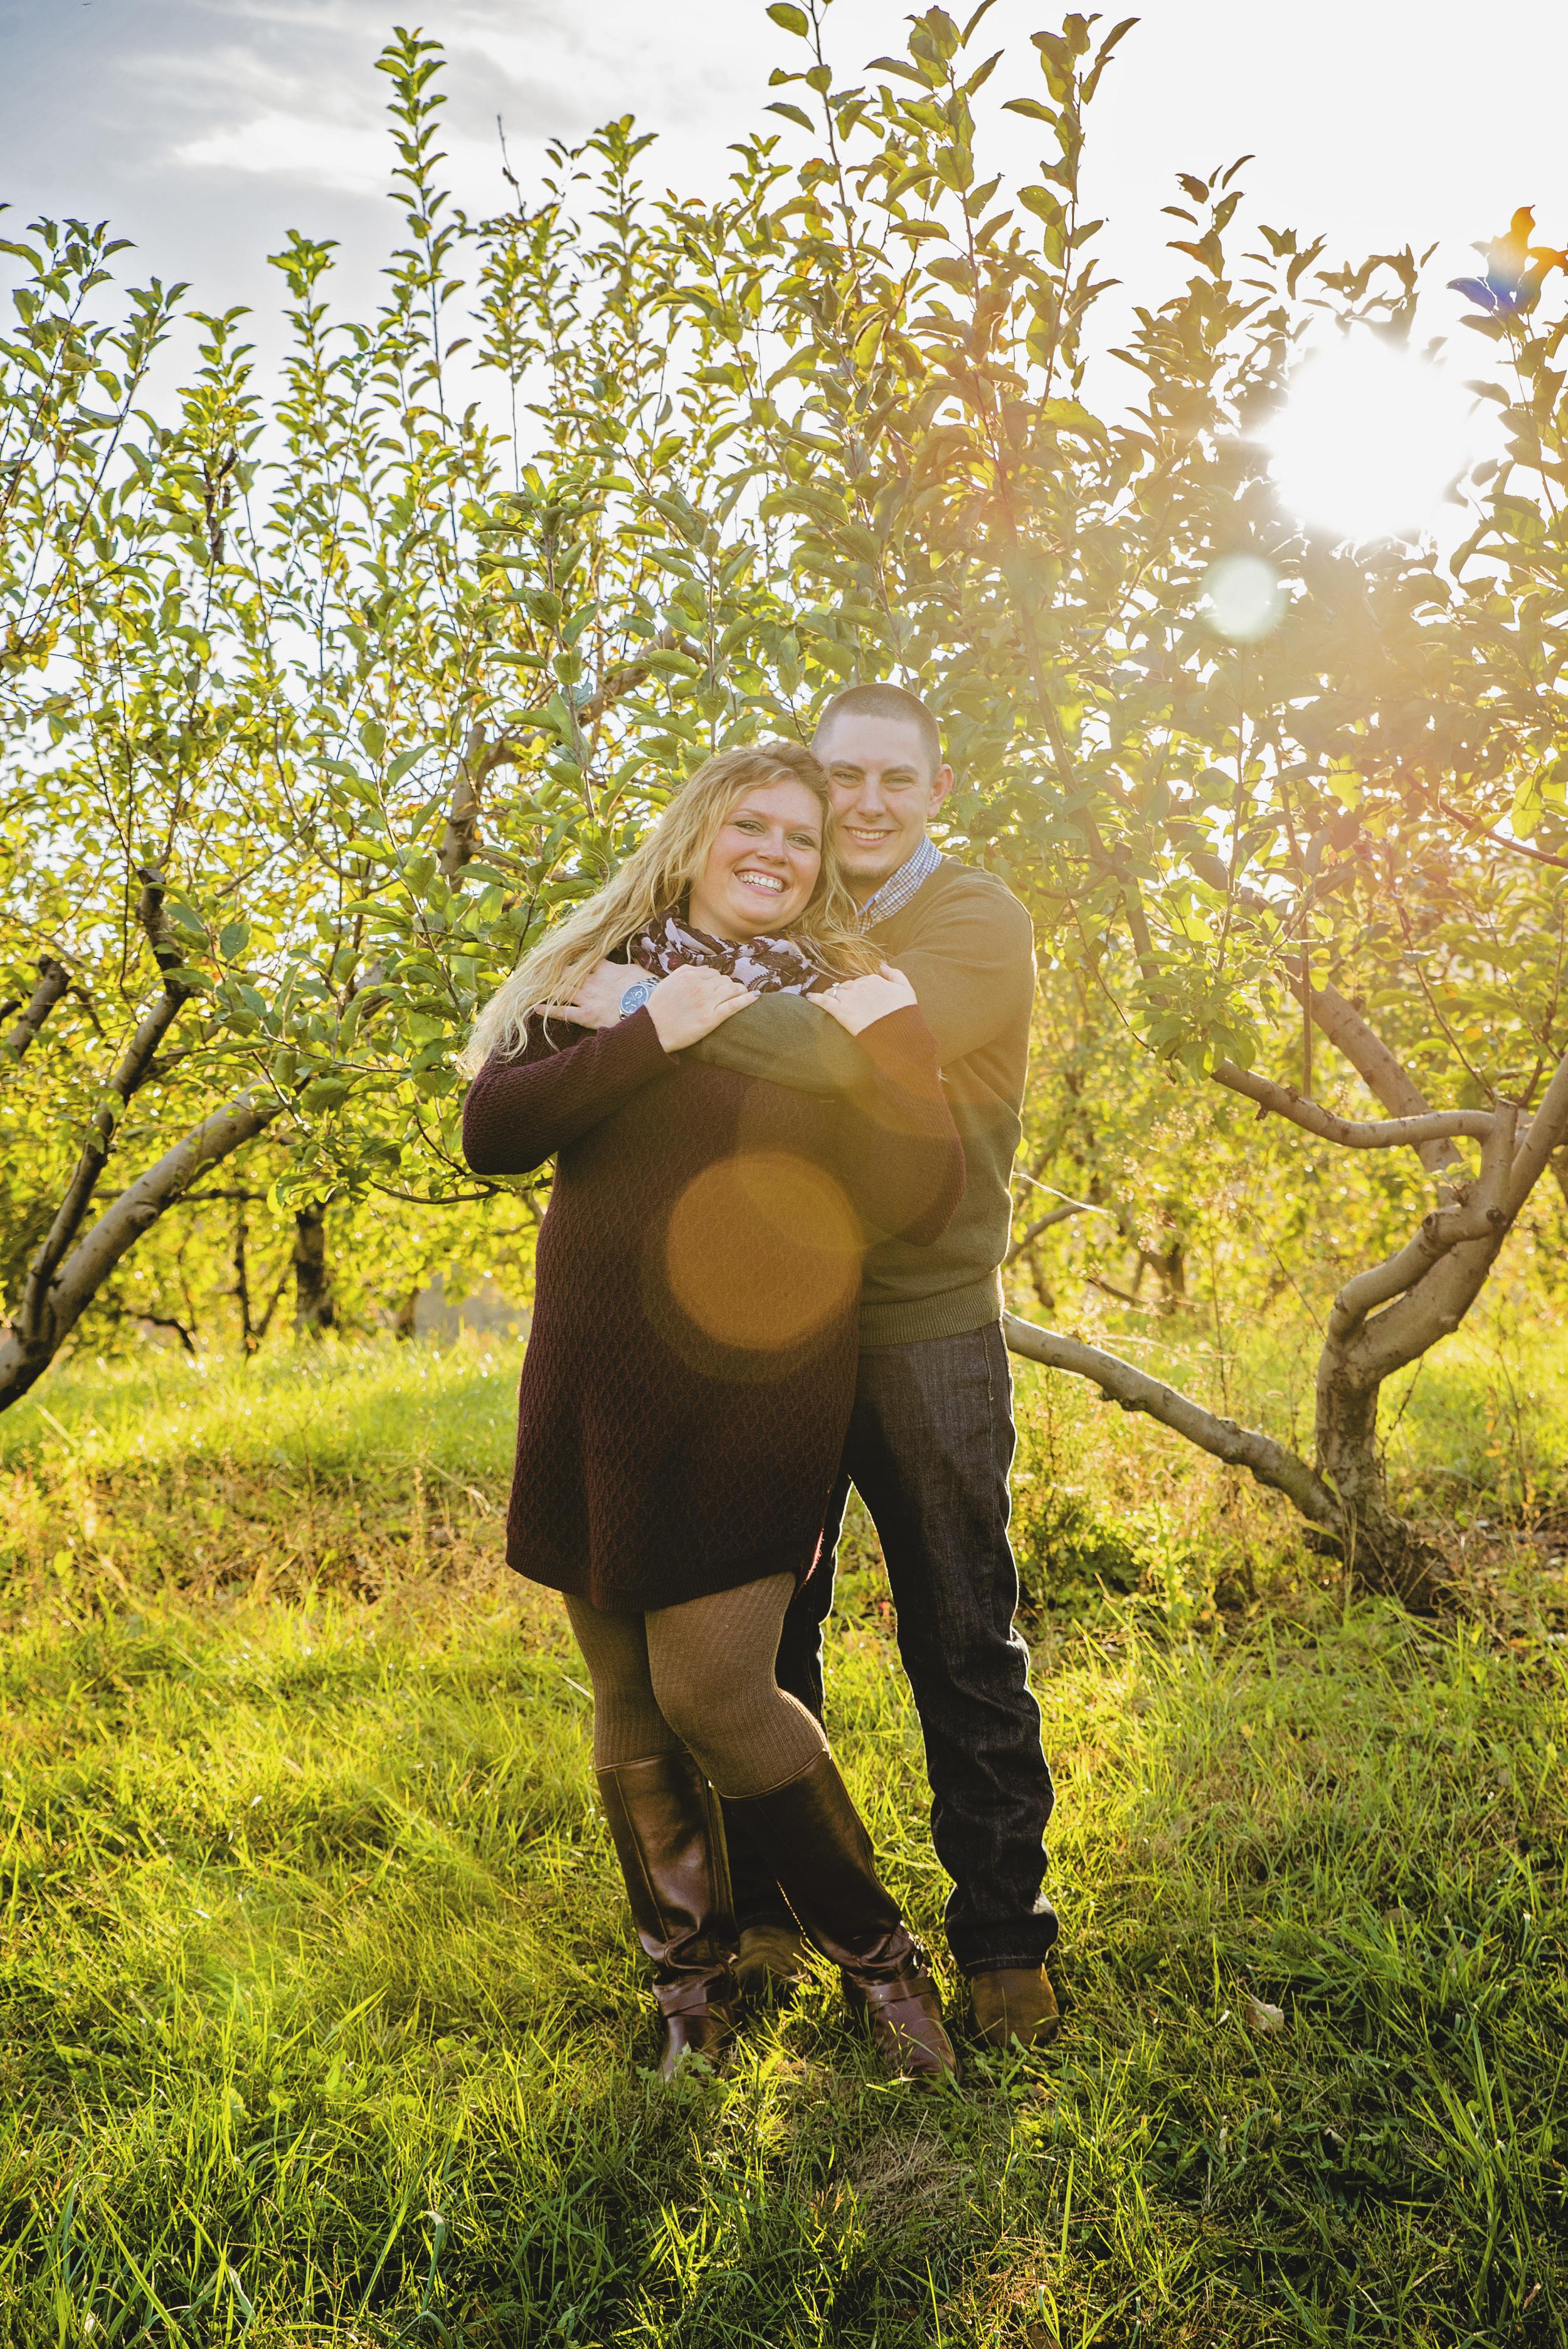 fall_romantic_orchard_engagement_session_lynchburg_va009.jpg